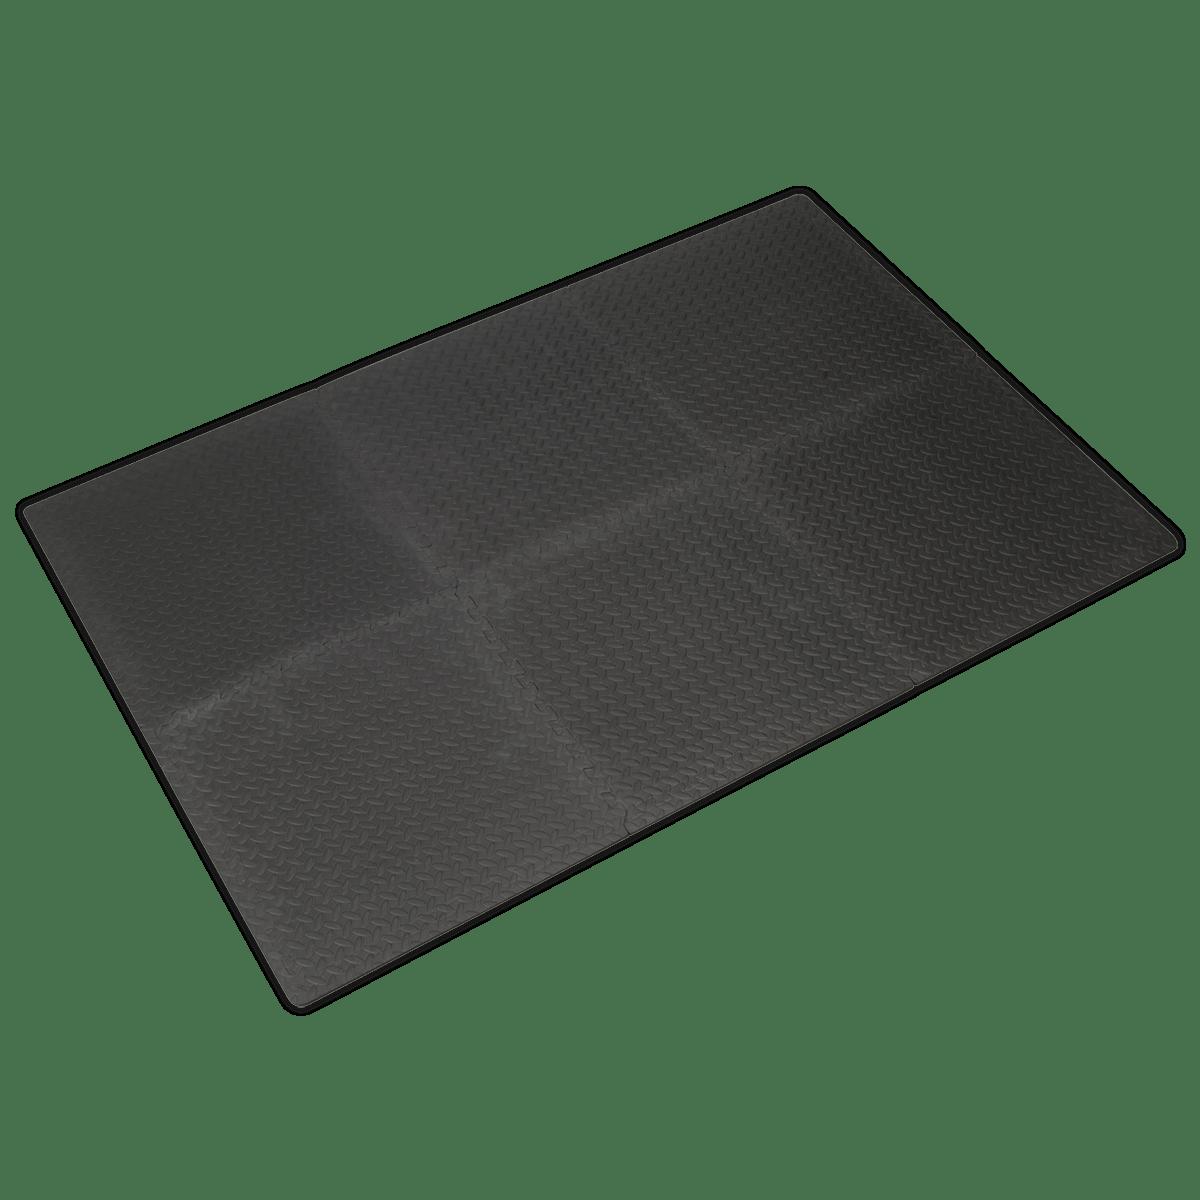 Sealey Interlocking EVA Foam Workshop Mat Set 1200 x 1800mm MIC1218 | Hard-wearing anti-slip EVA foam matting suitable for use in the workshop and machine room. | toolforce.ie